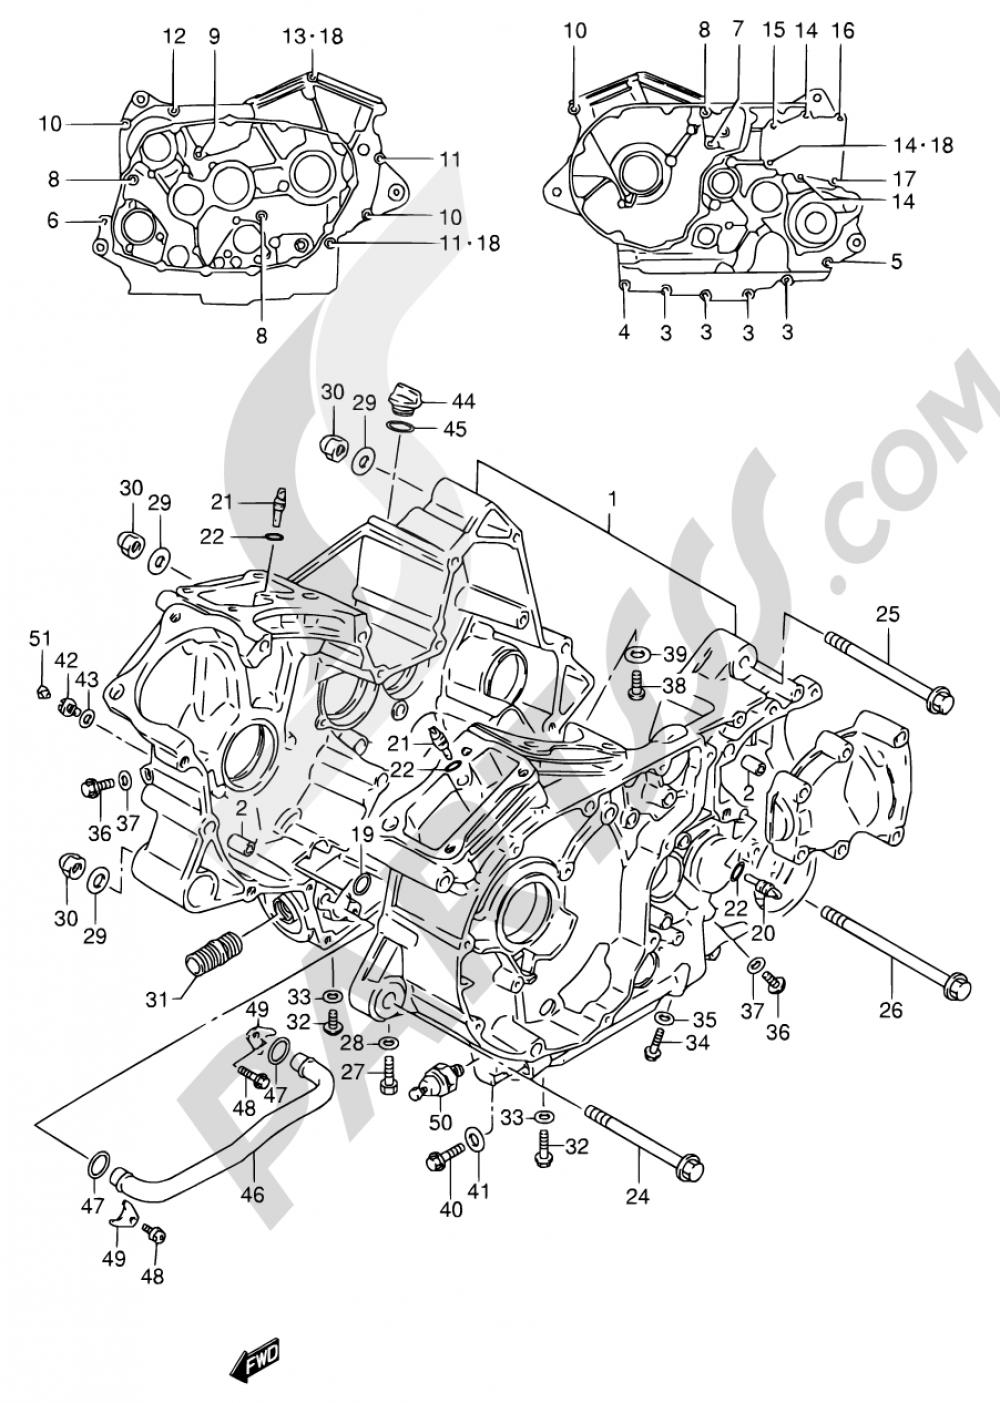 4 - CRANKCASE Suzuki VS600GL 1995